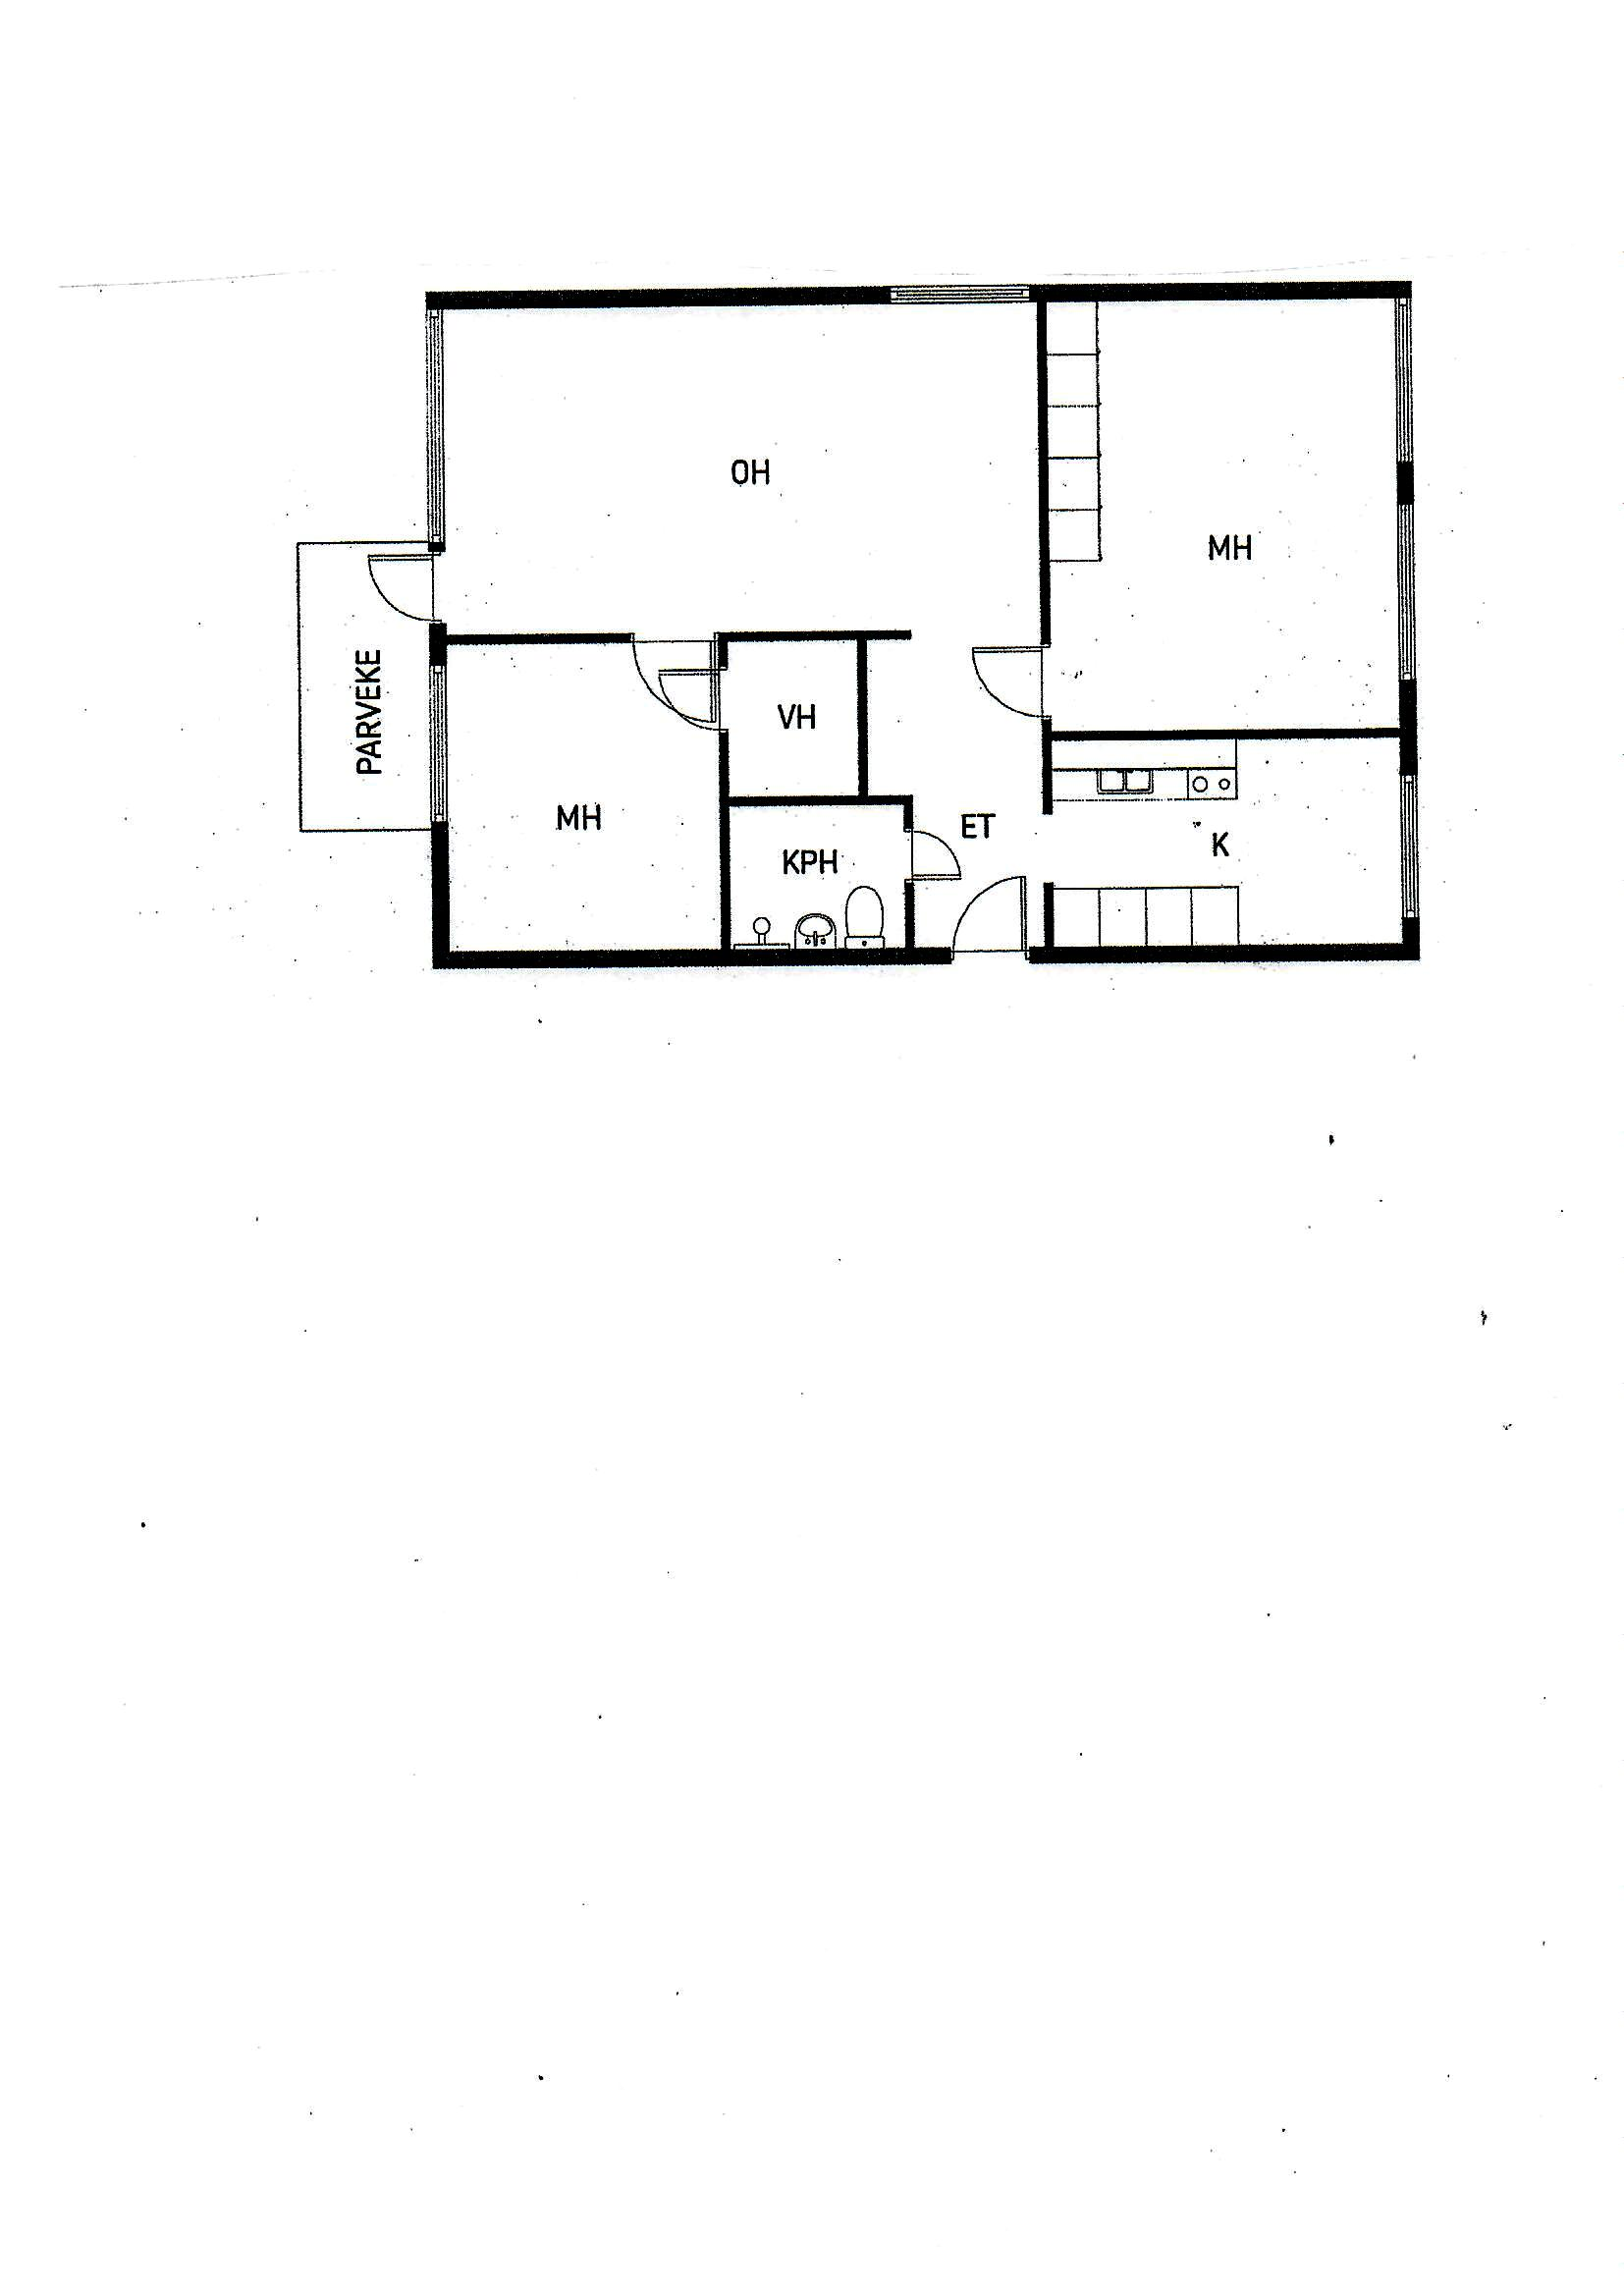 Waurionkatu 6 B11, Loimaa